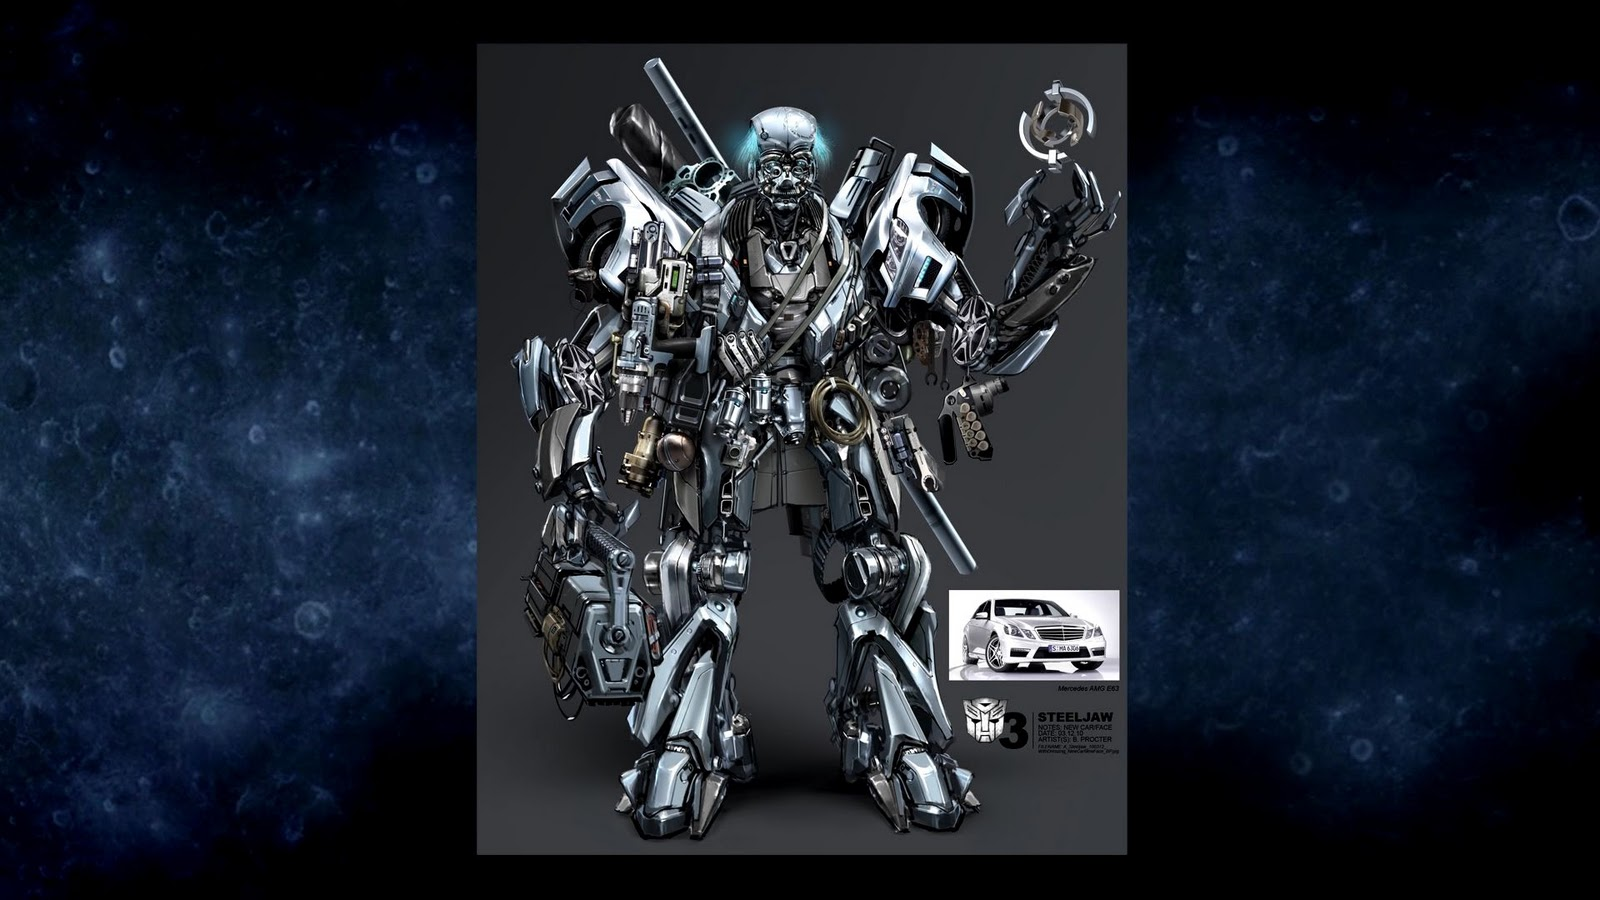 Transformers Dark Of The Moon 2011 Faq